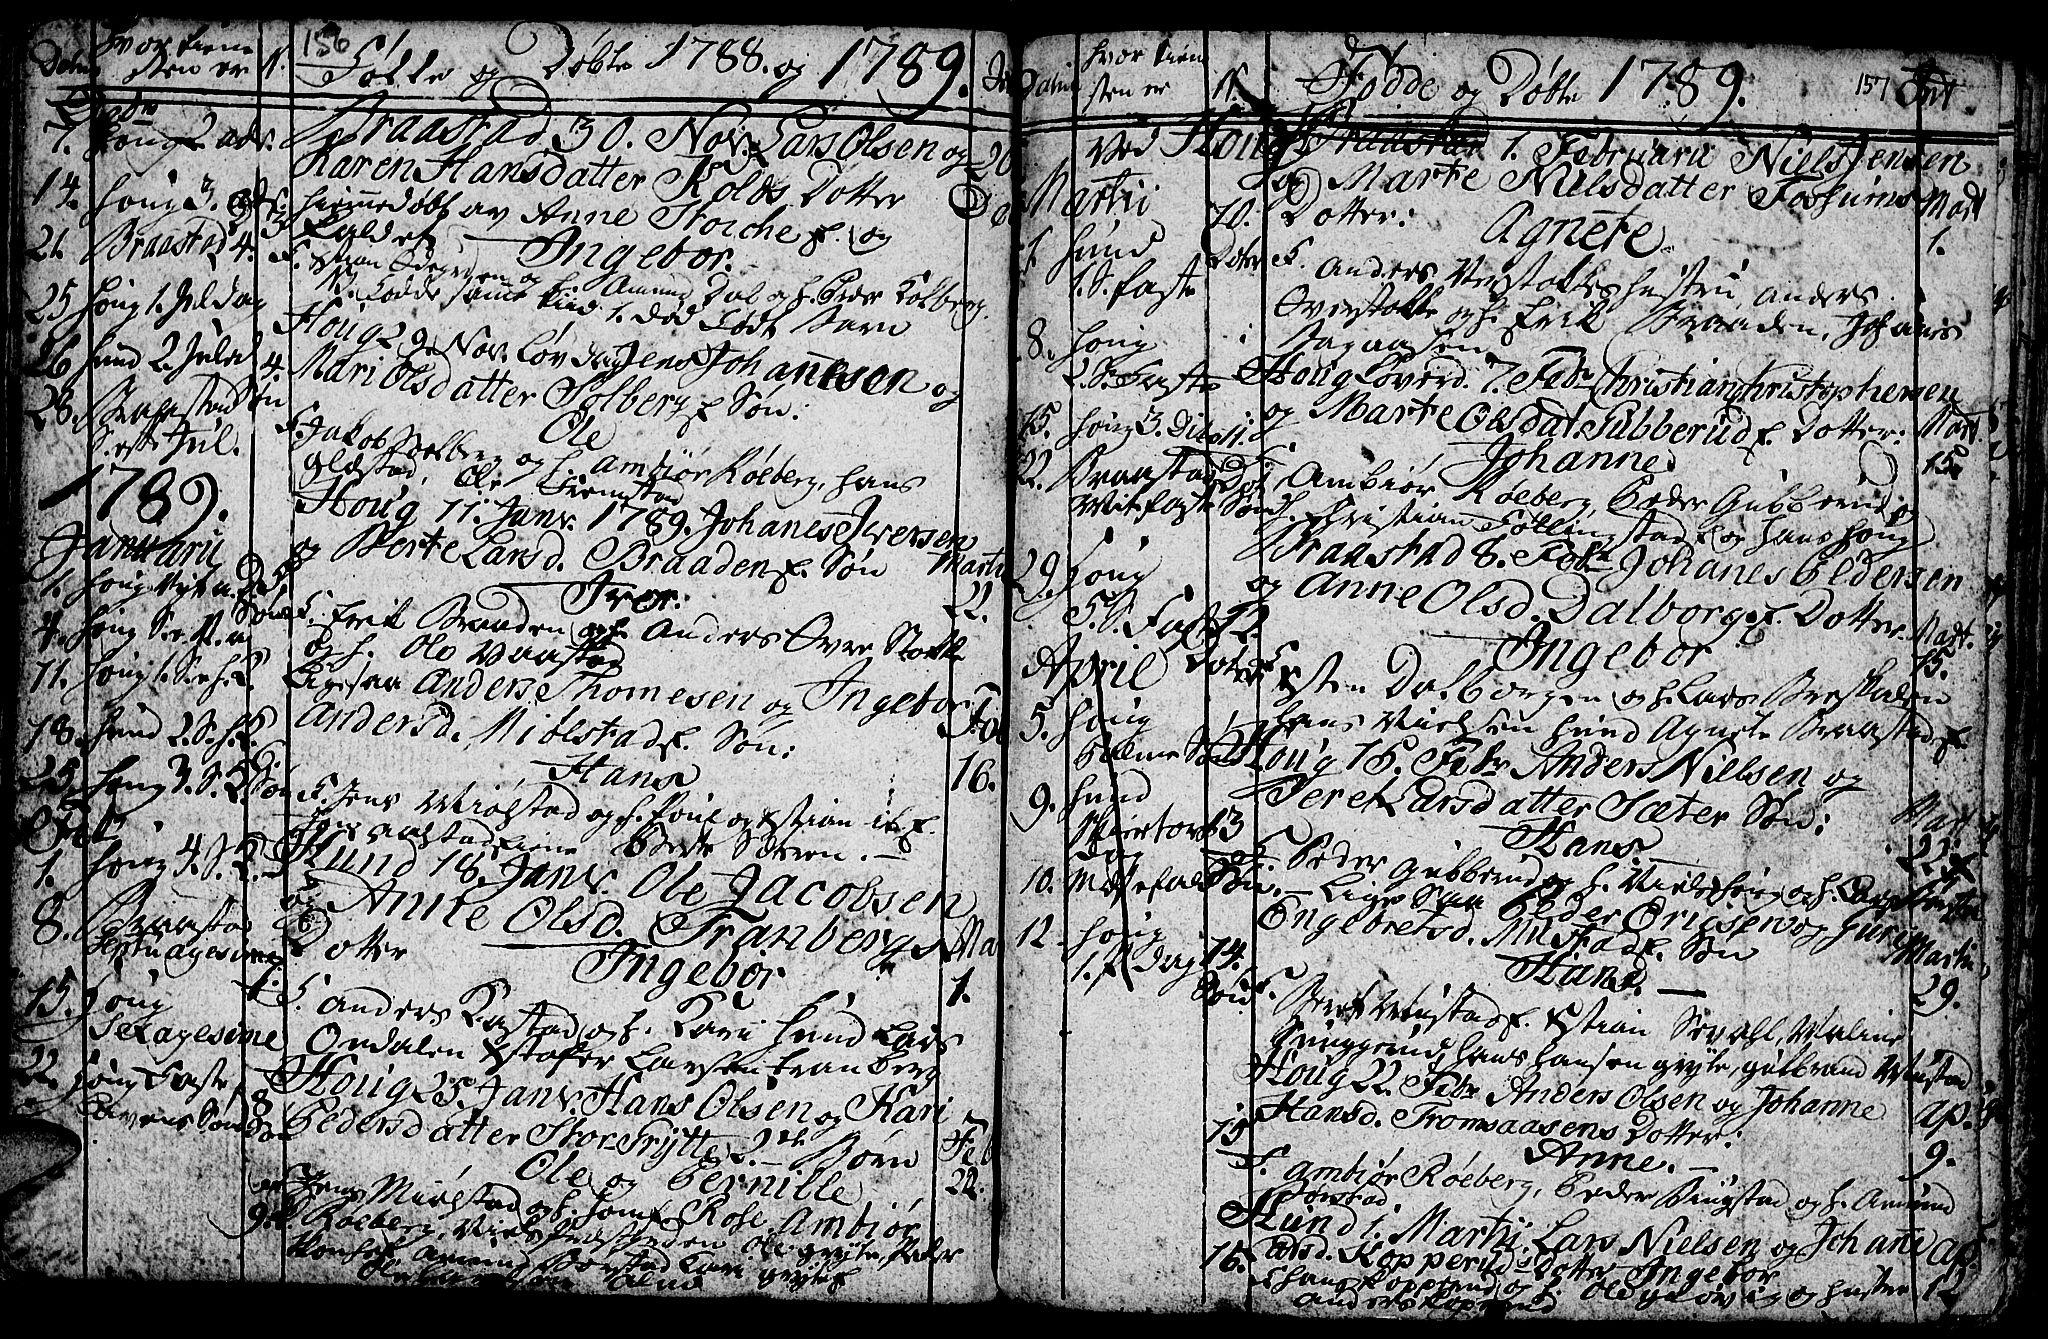 SAH, Vardal prestekontor, H/Ha/Hab/L0001: Klokkerbok nr. 1, 1771-1790, s. 156-157